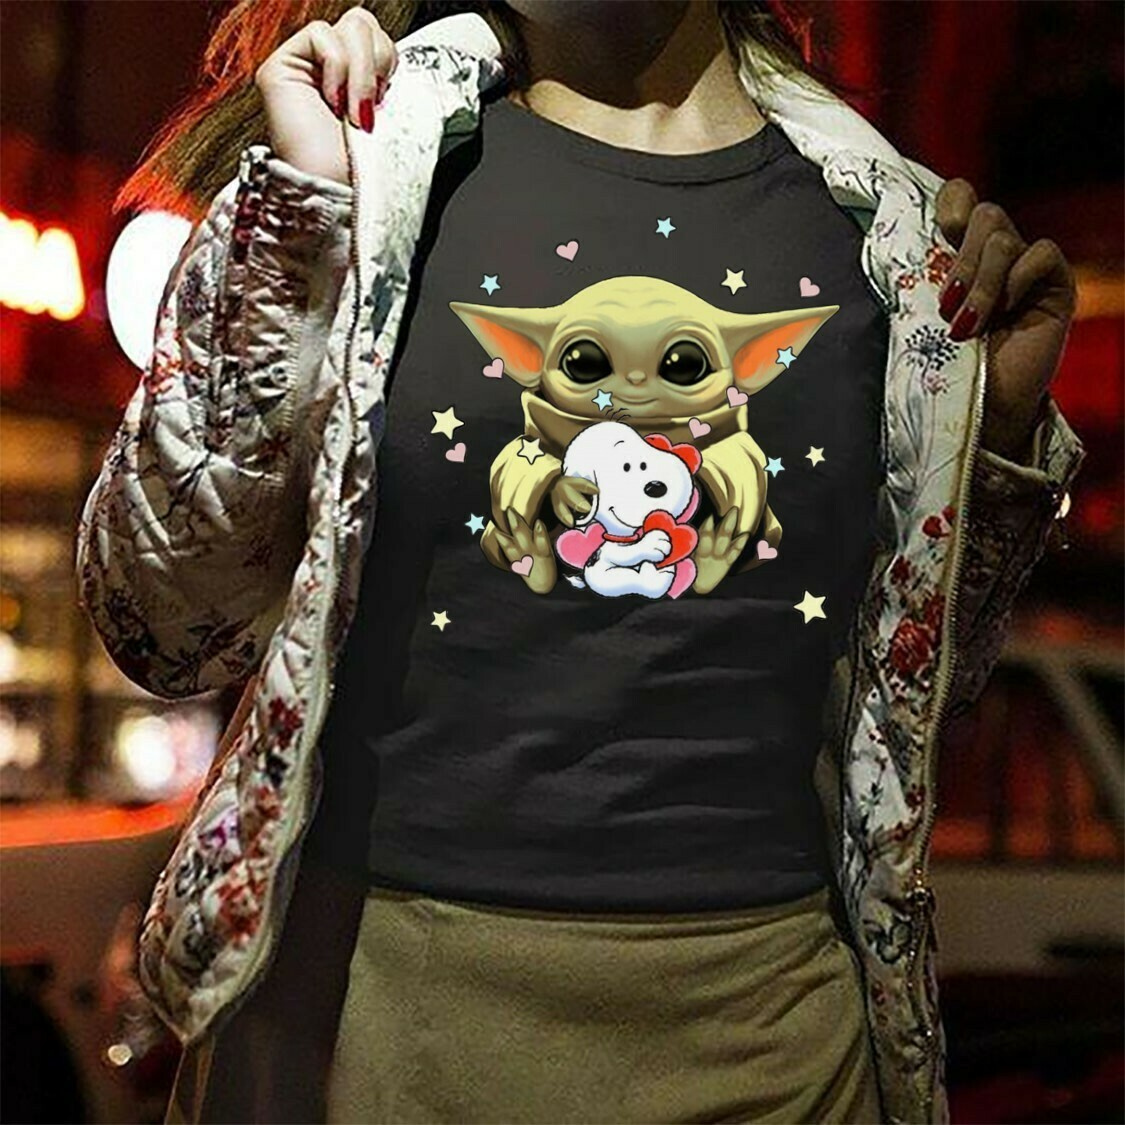 Baby Yoda mashup Snoopy Star Wars funny the mandalorian the child first memories floating pod Kawaii King Boba Fett Lion King T-Shirt Long Sleeve Sweatshirt Hoodie Jolly Family Gifts